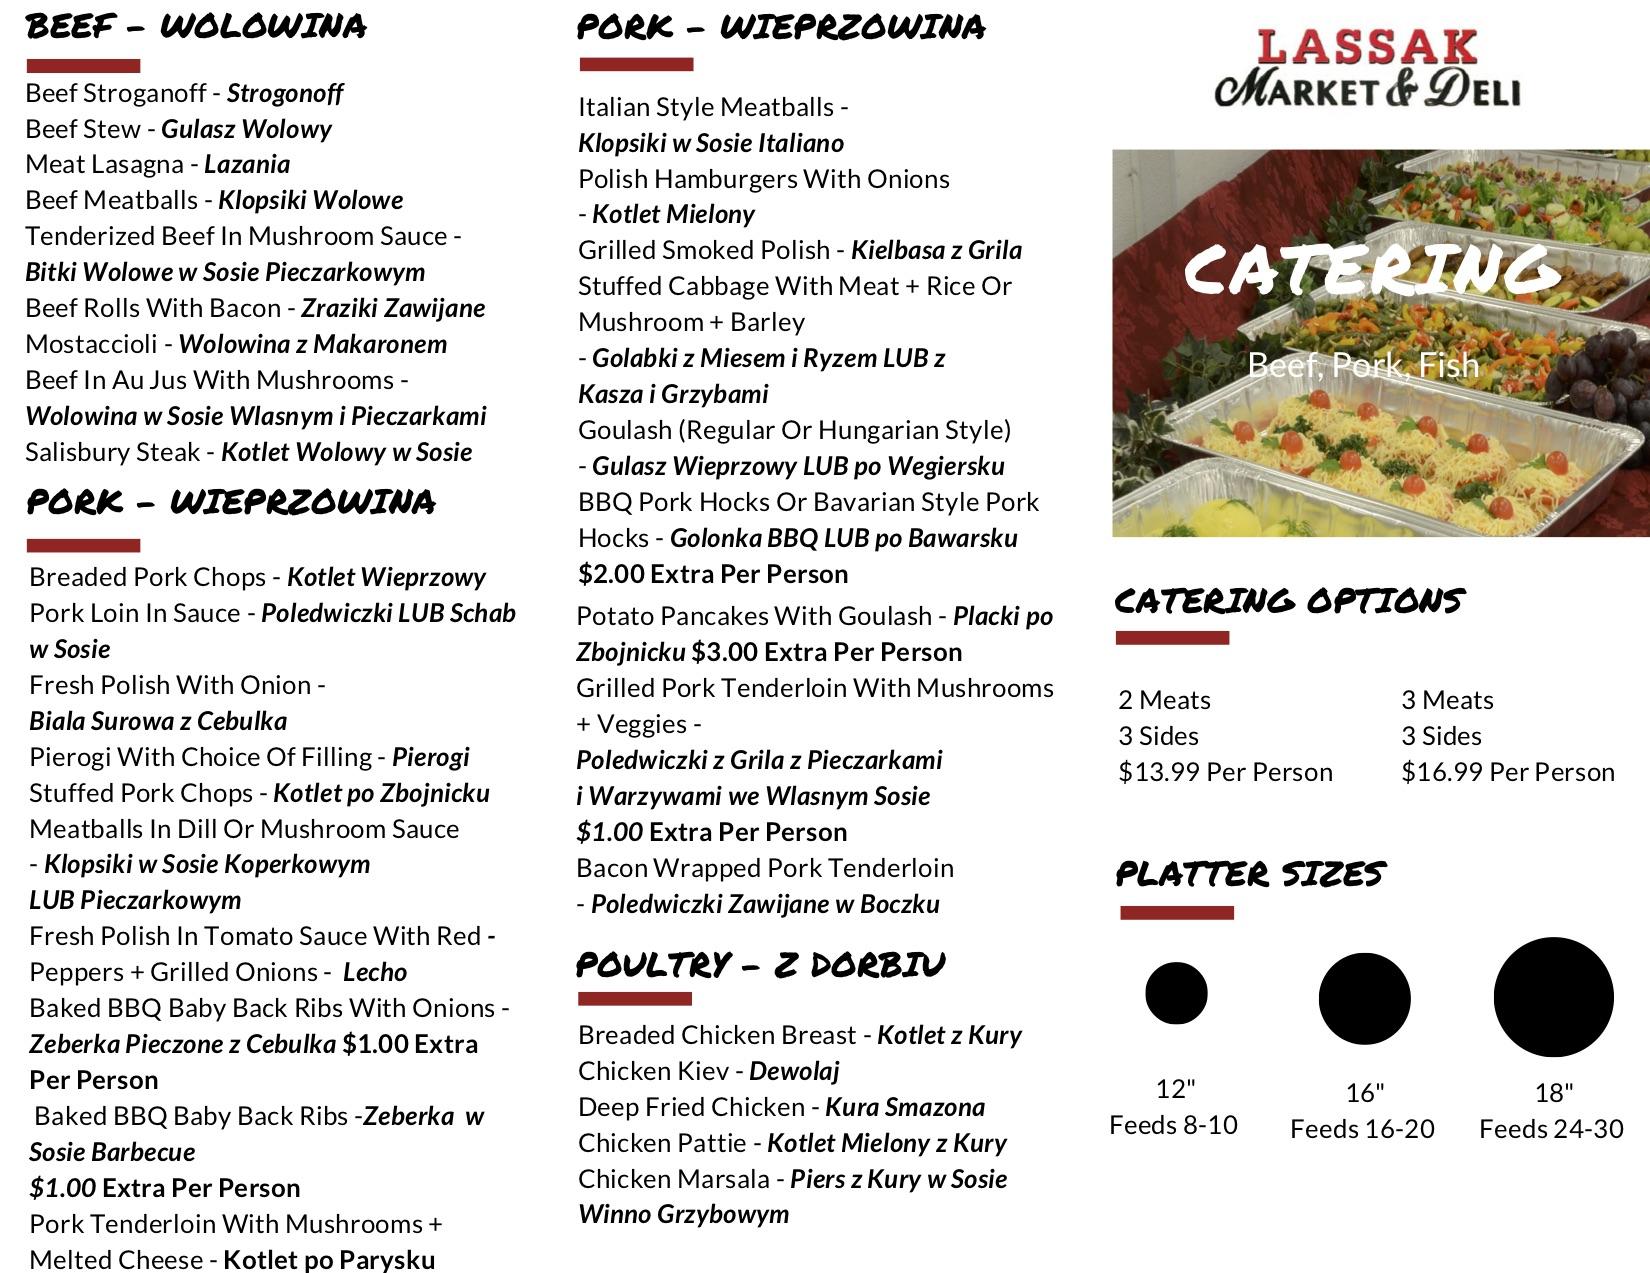 Lassak Market & Deli Catering Brochure